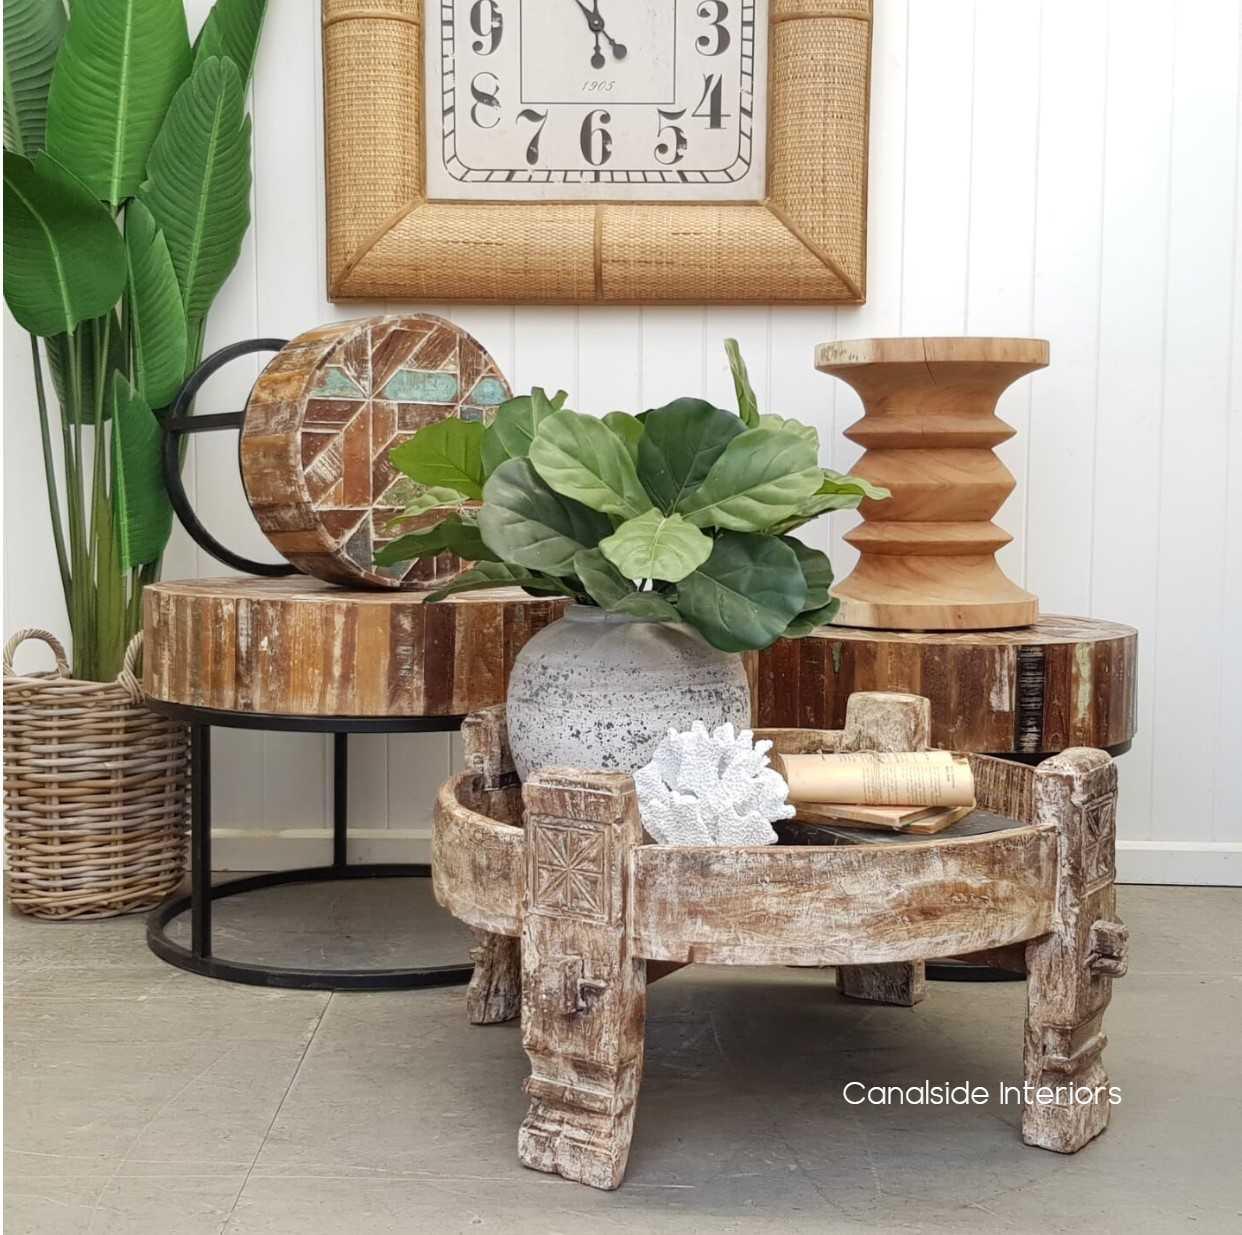 Chakki CoffeeSide Table  INDUSTRIAL RUSTIC Style, CAFE FURNITURE, TABLES, TABLES Coffee Tables, TABLES Side Tables, LIVING Room, LIVING Coffee & Side Tables, CAFE FURNITURE Table Tops & Tables, PLANTATION STYLE